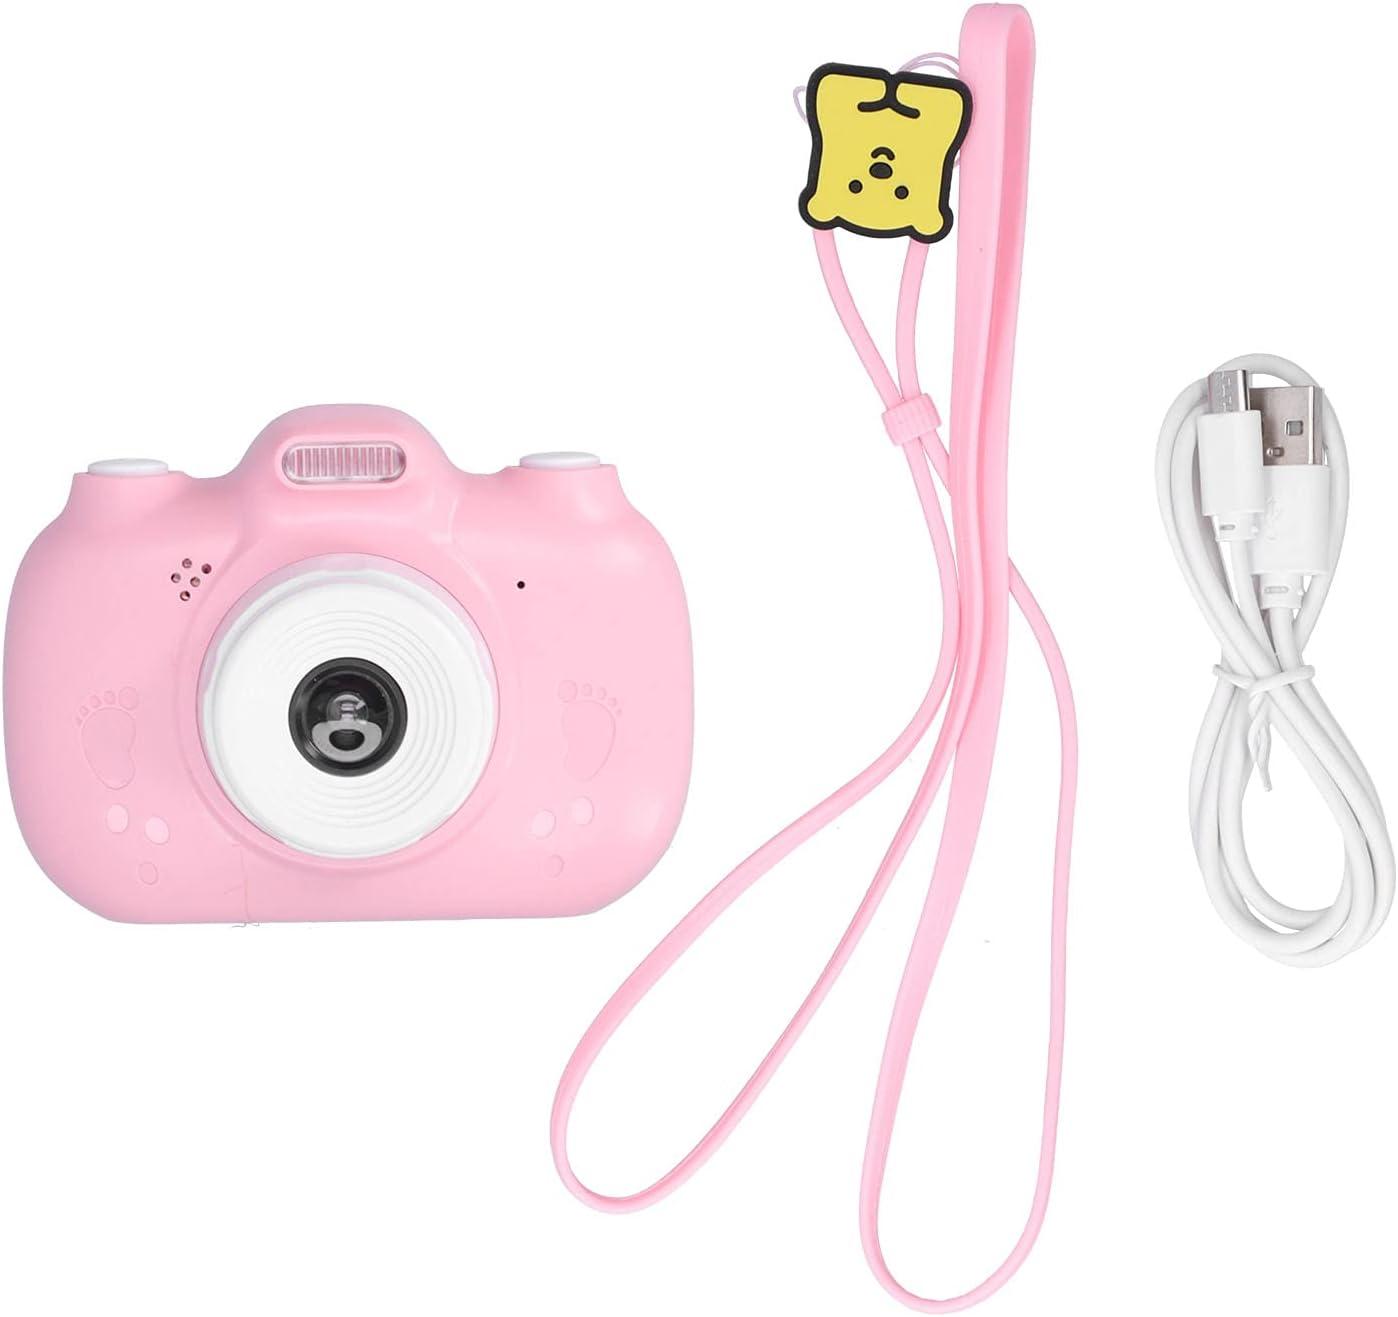 FASJ Toddler Camera Children Industry No. 1 Safety and trust Digital Cartoon Camer 1080P